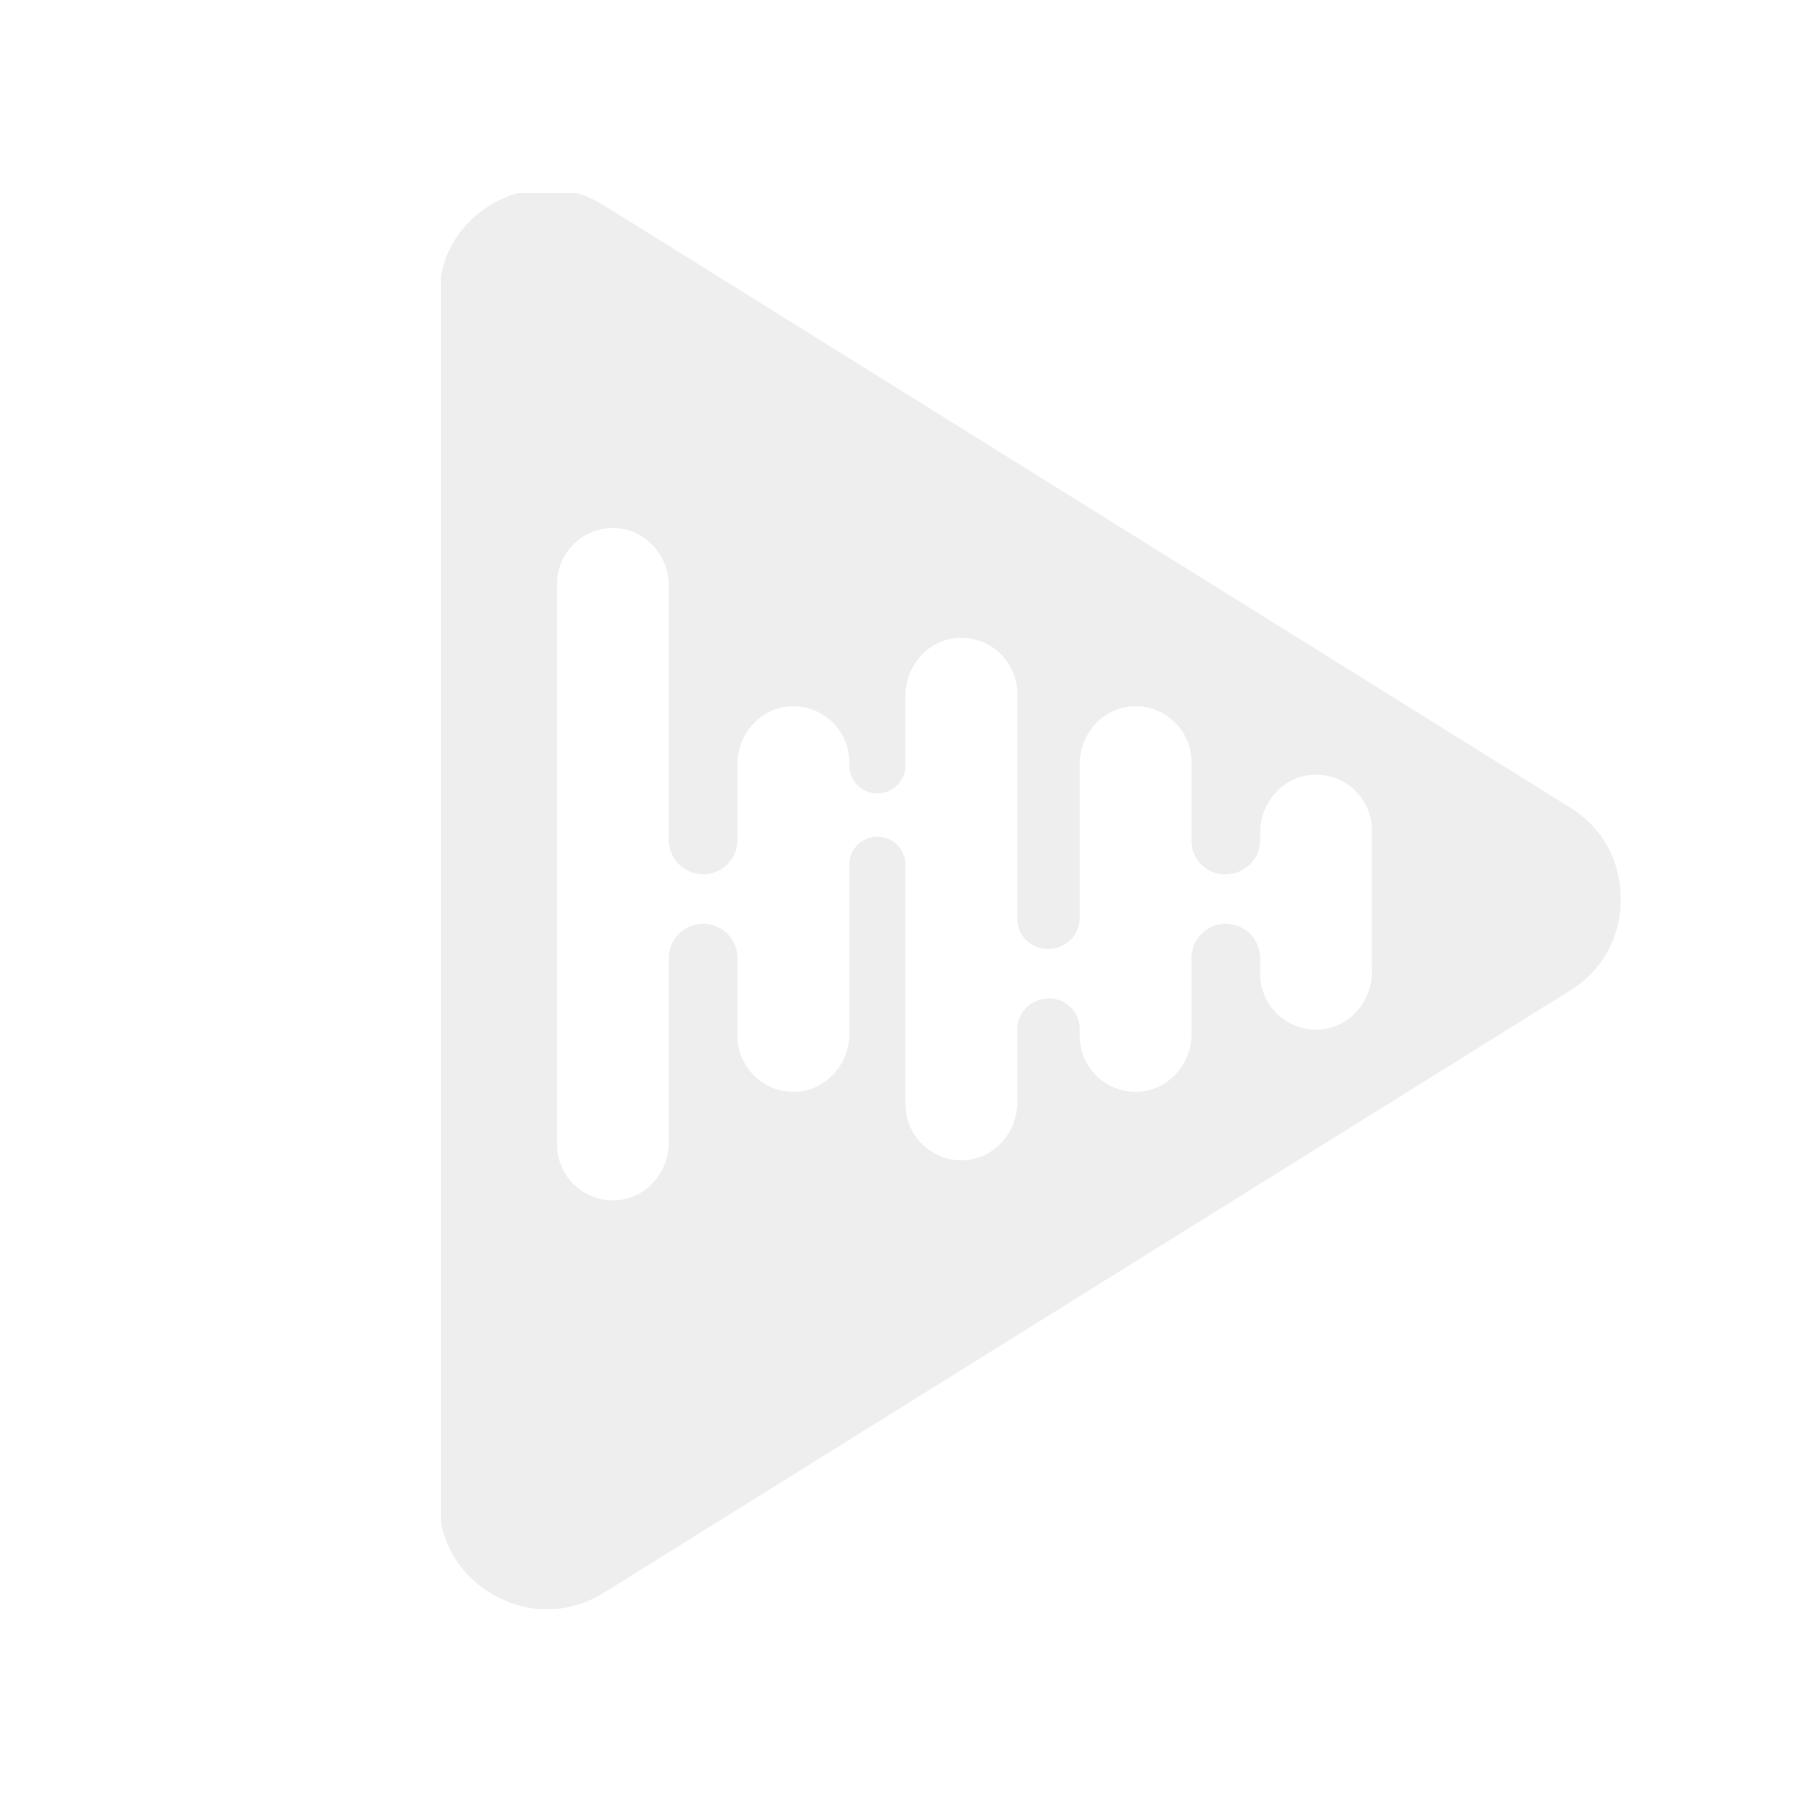 Speedsignal B-3444703-1